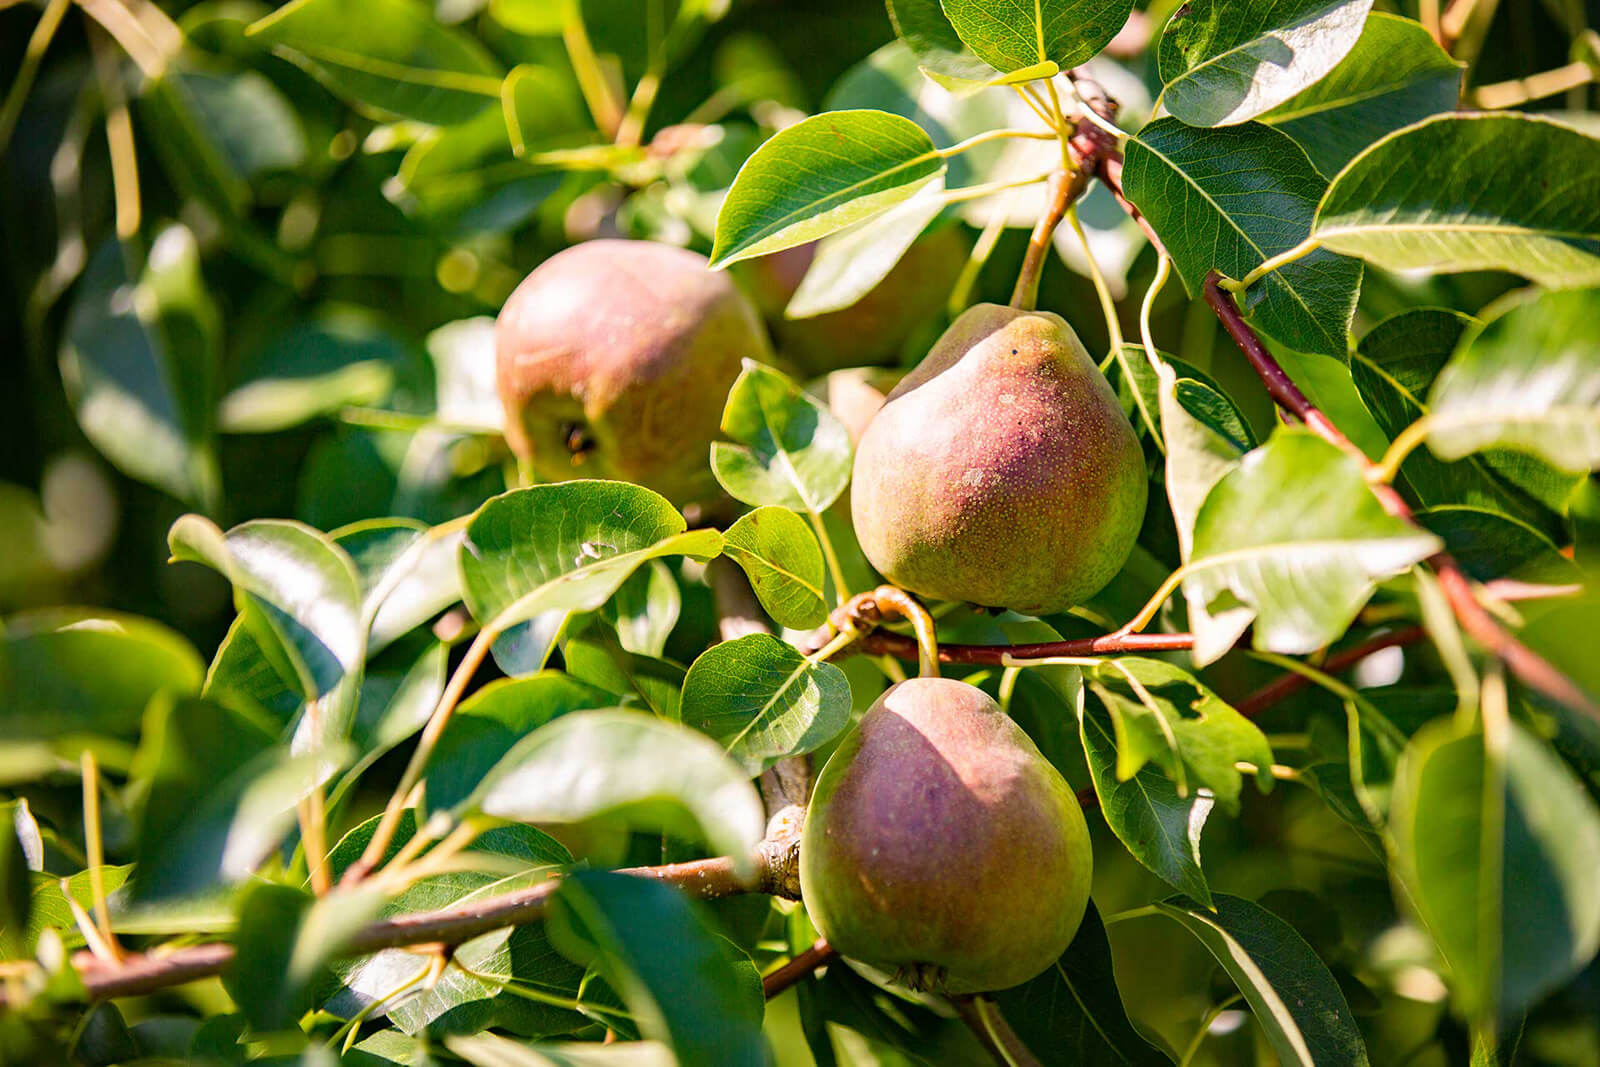 Peren en appels natuurgebied Limburg